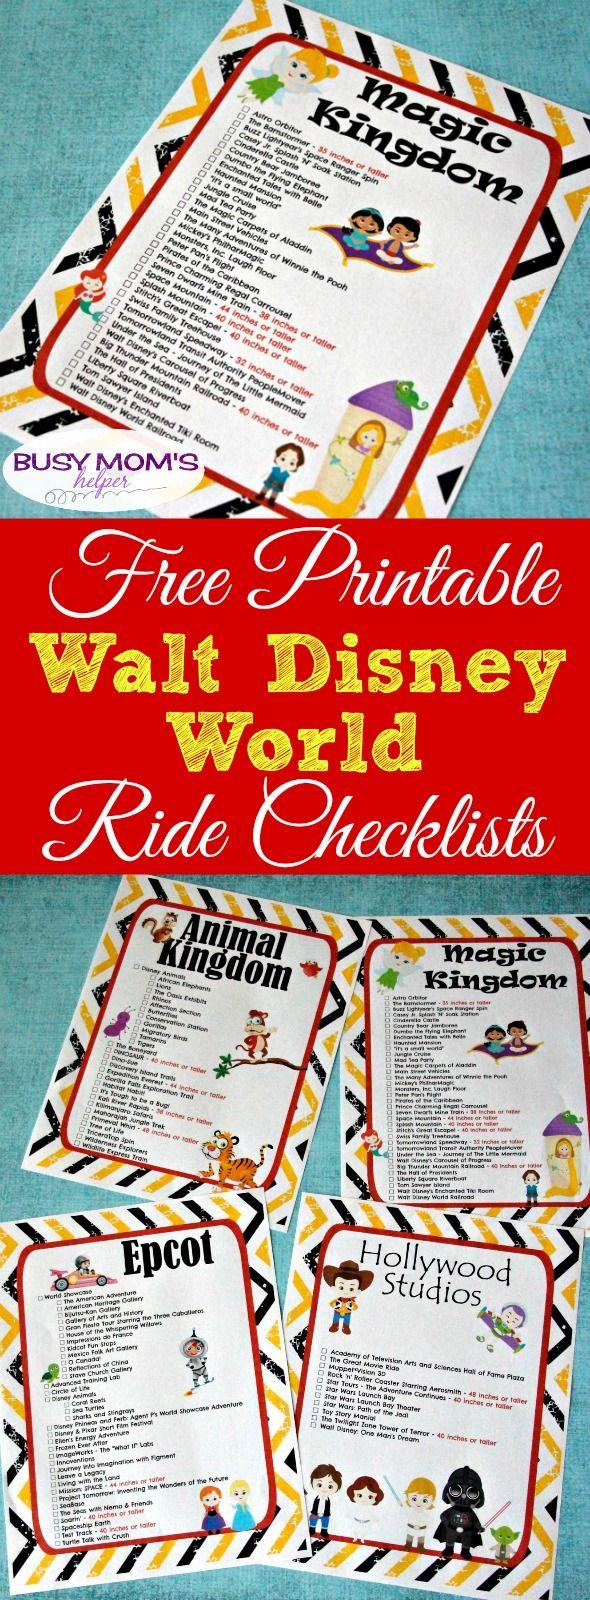 Free Printable Walt Disney World Ride Checklists   Walt